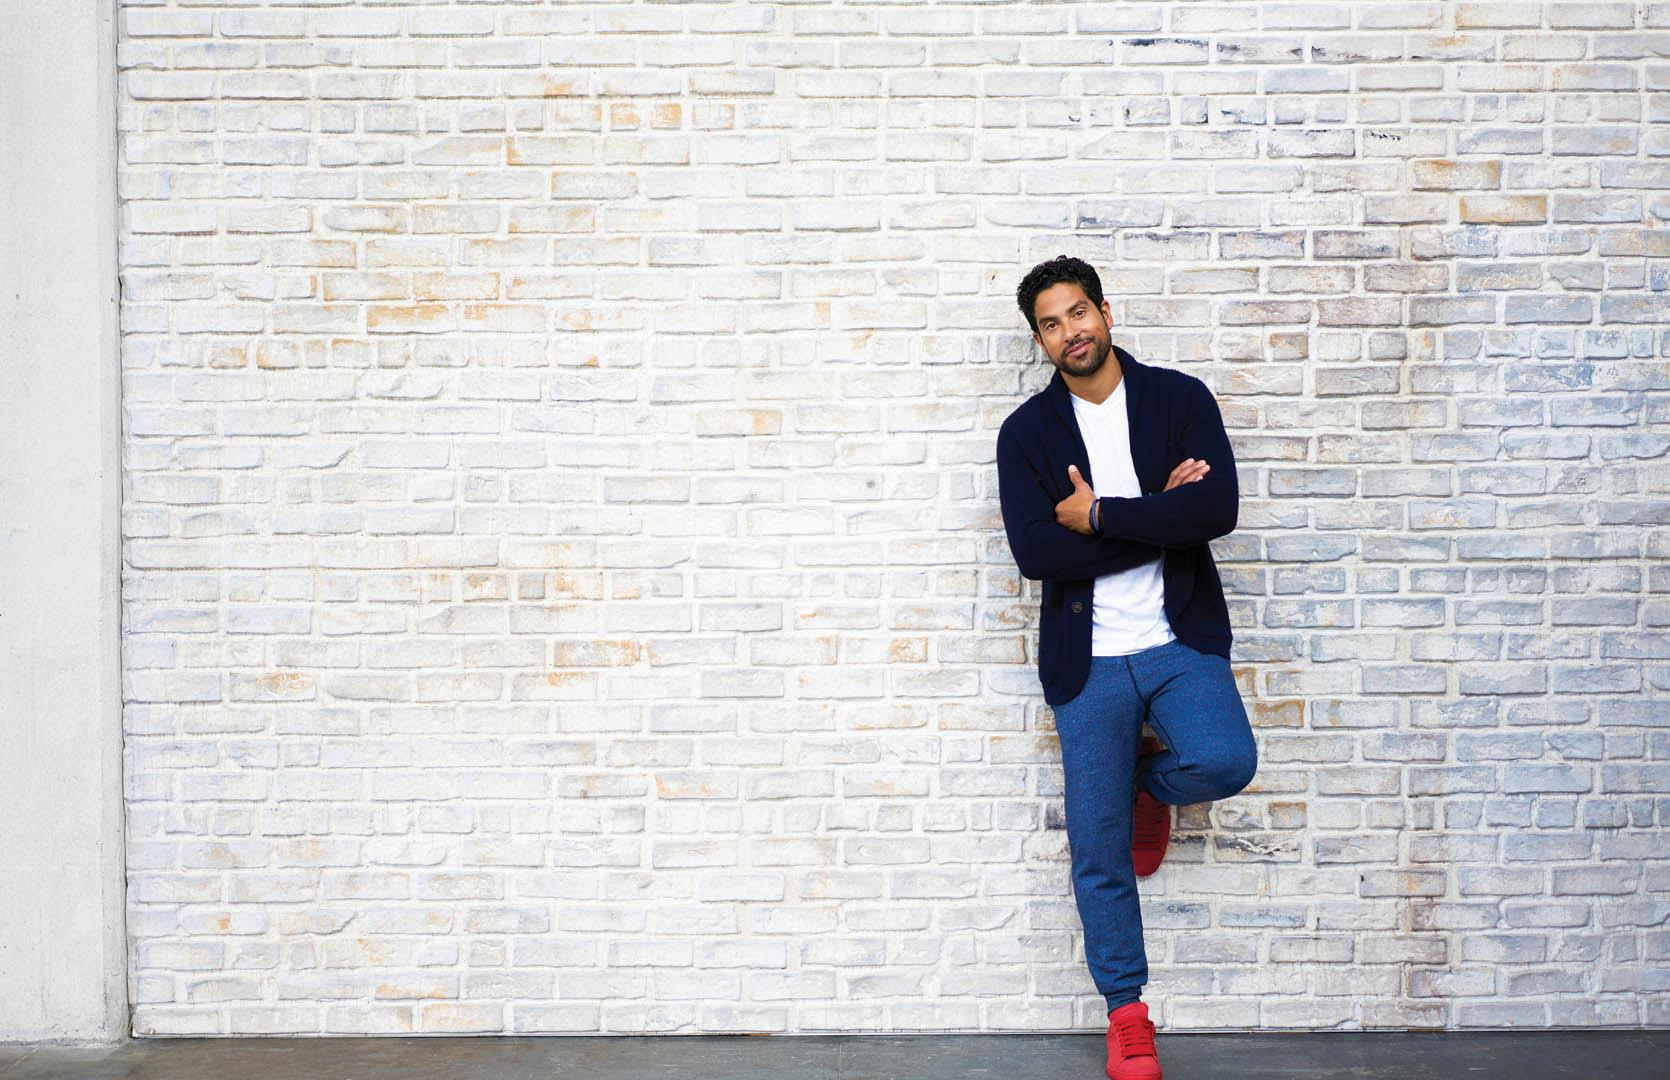 Adam Rodriguez, especially when he makes casual look haute